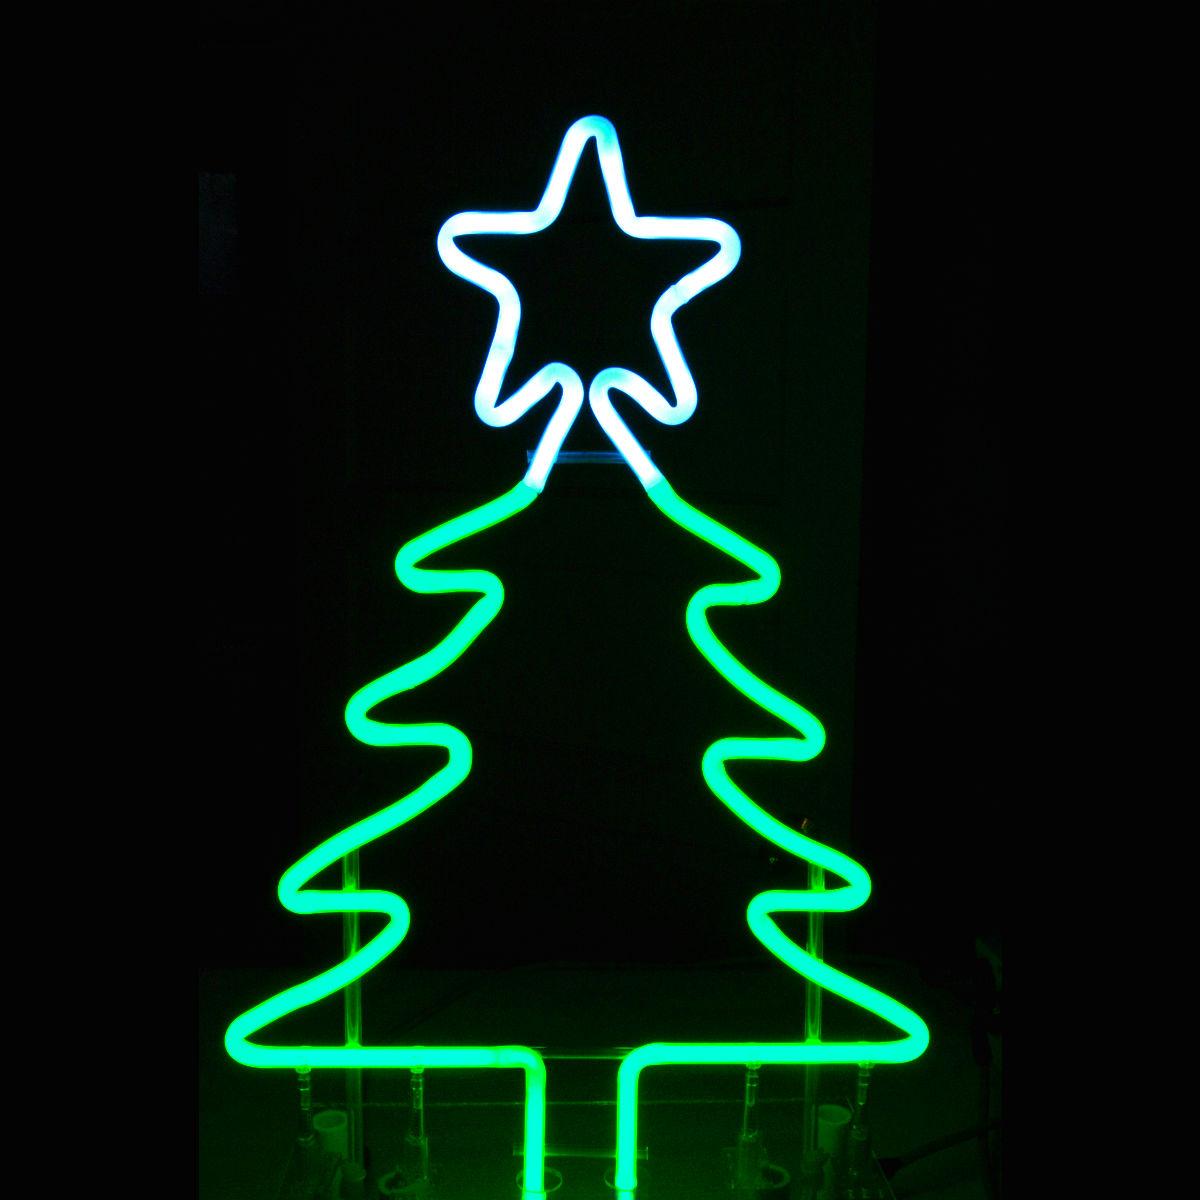 Tabletop Designer bright green neon Christmas Tree with Snow White Neon Star ..... by John C. Barton - International Neon Glass Artist